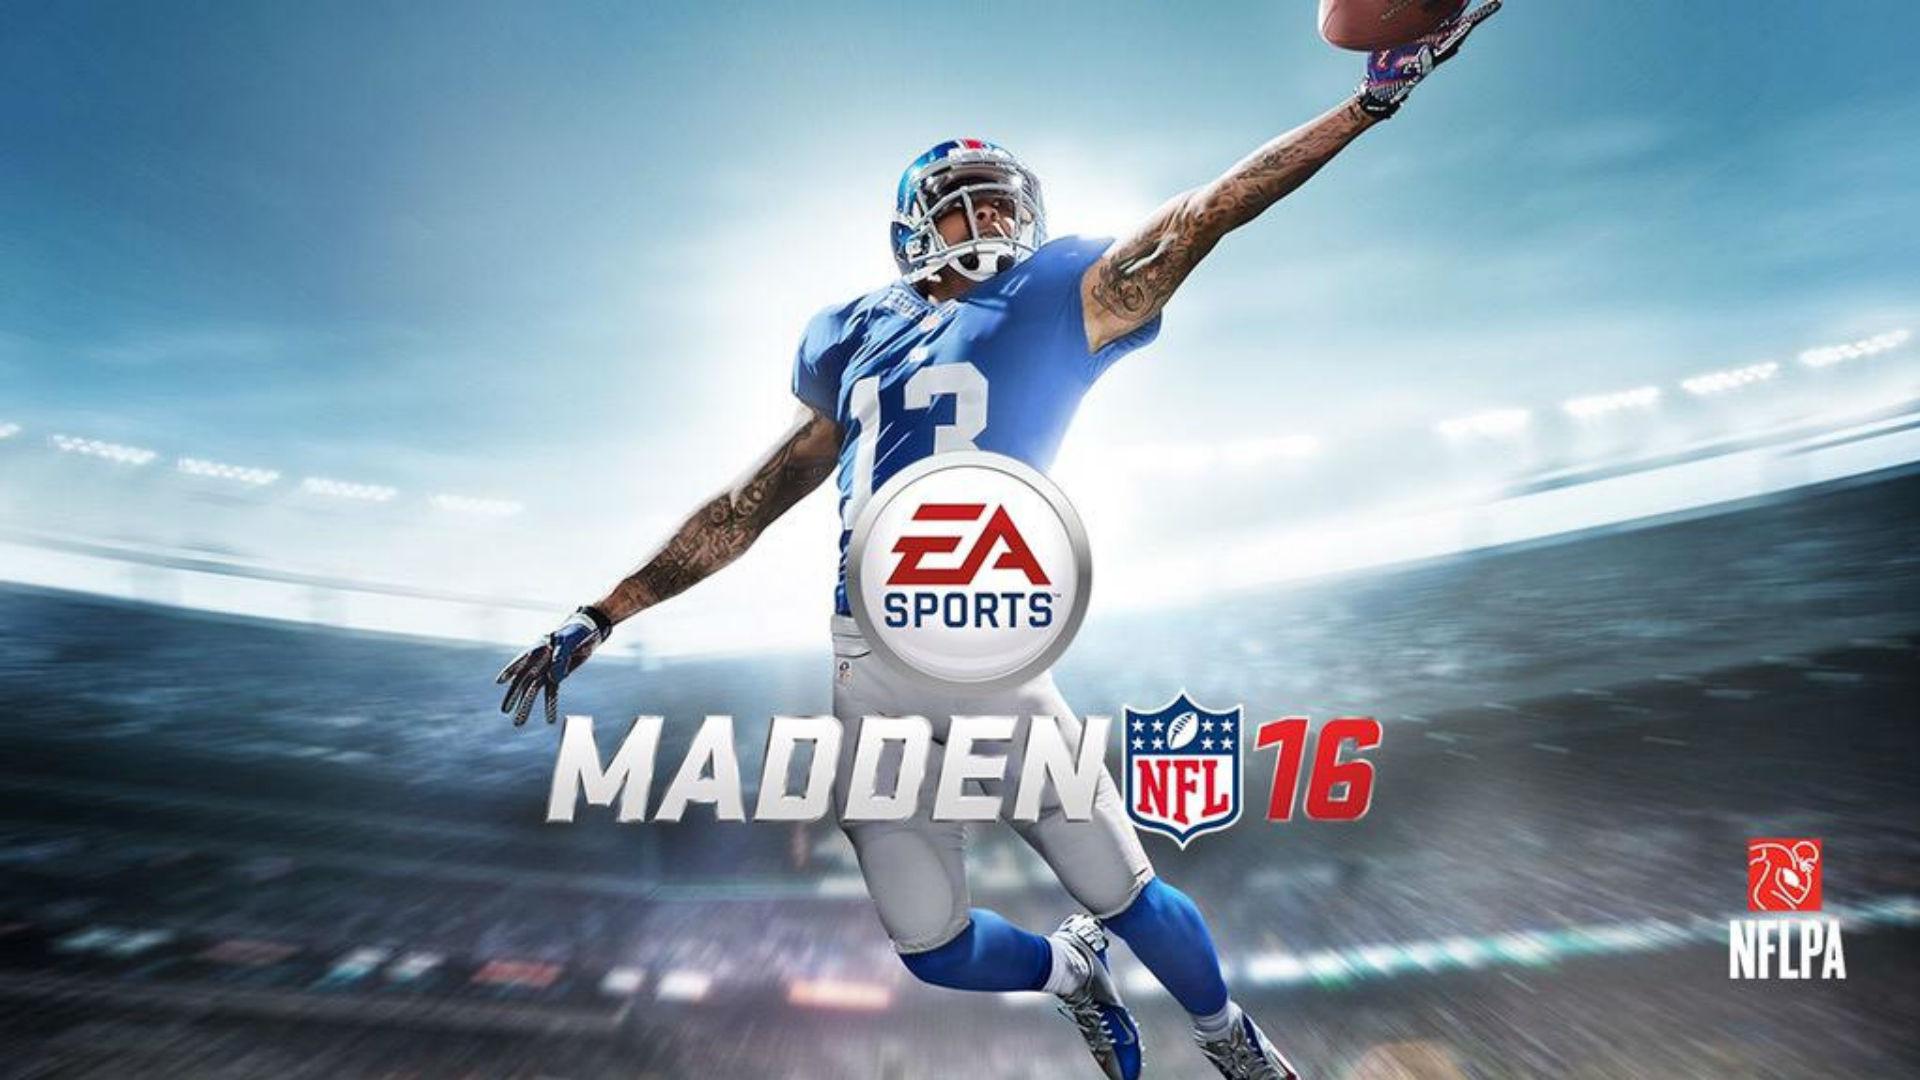 odell beckham jr madden nfl 16 cover ftrjpg py1r6b9do4491kzjg0vg9j10q Madden NFL 16 ماه آینده به سرویس EA Access افزوده میشود